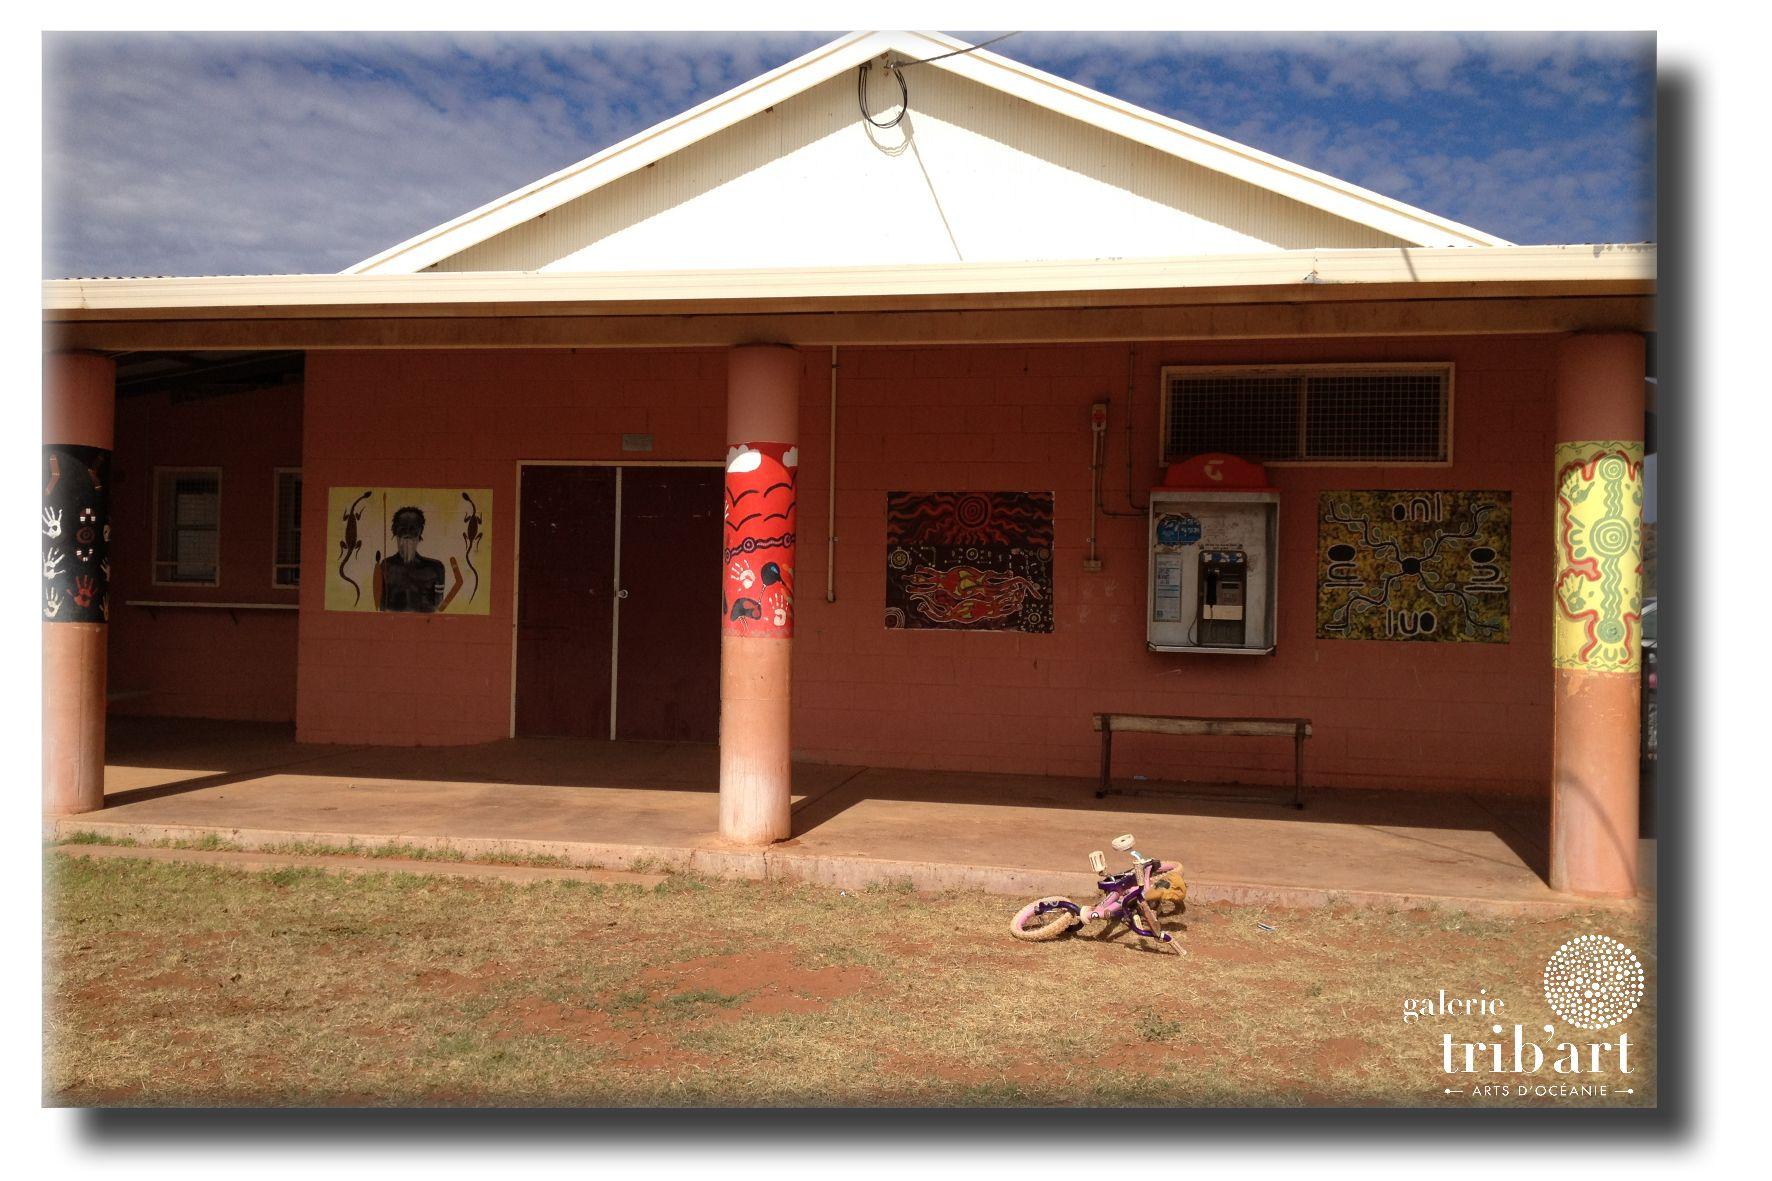 Photos AliceYendumu (page 29)